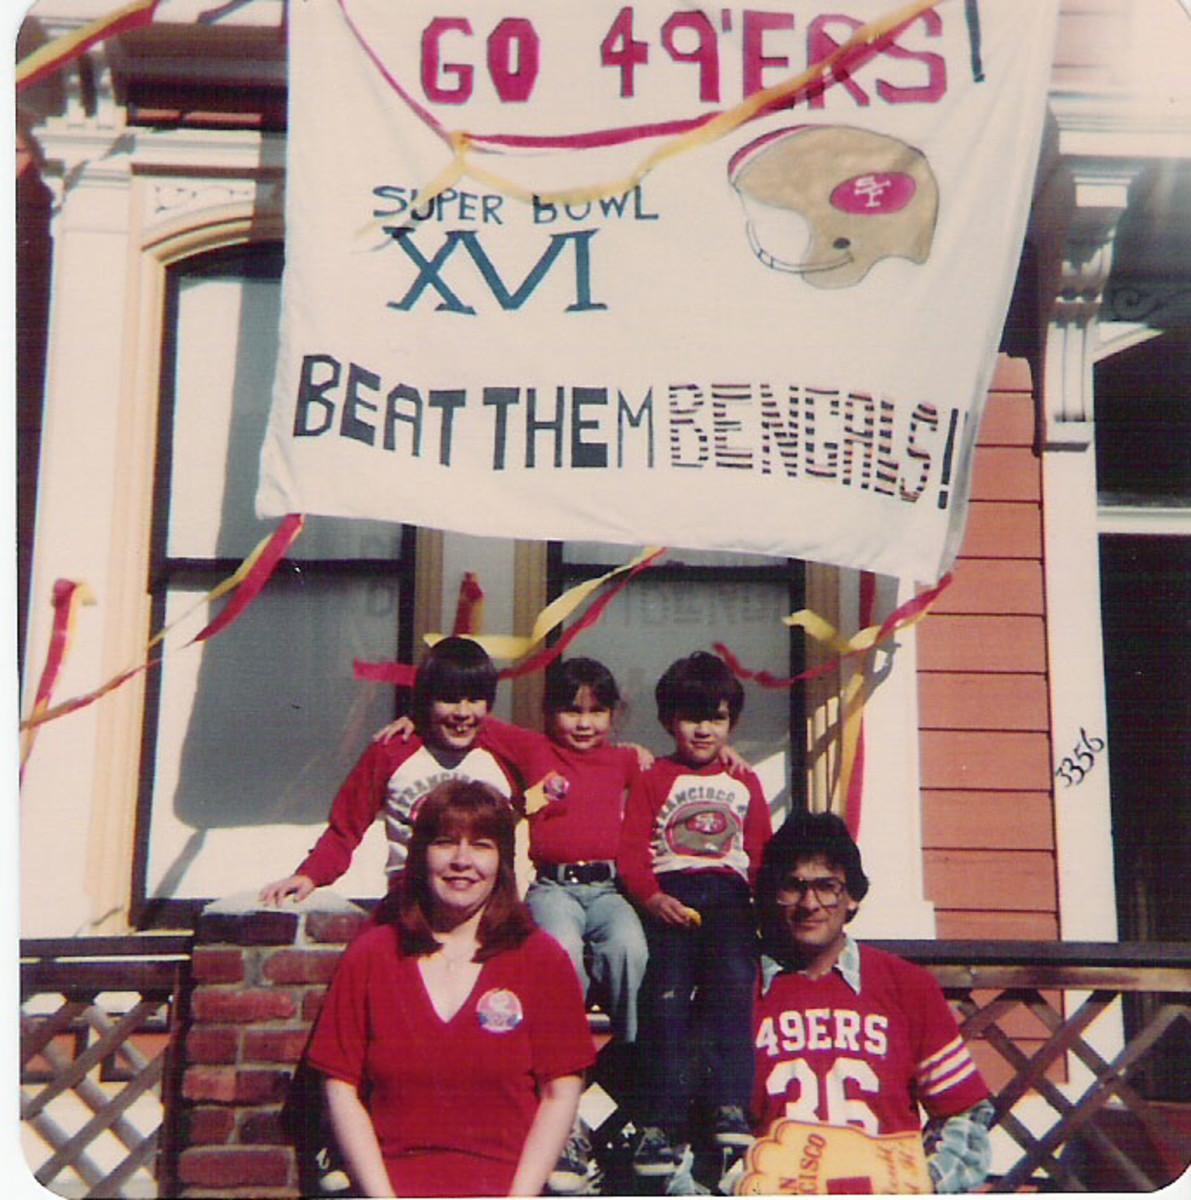 Super Bowl XVI - 49ers versus the Bengals